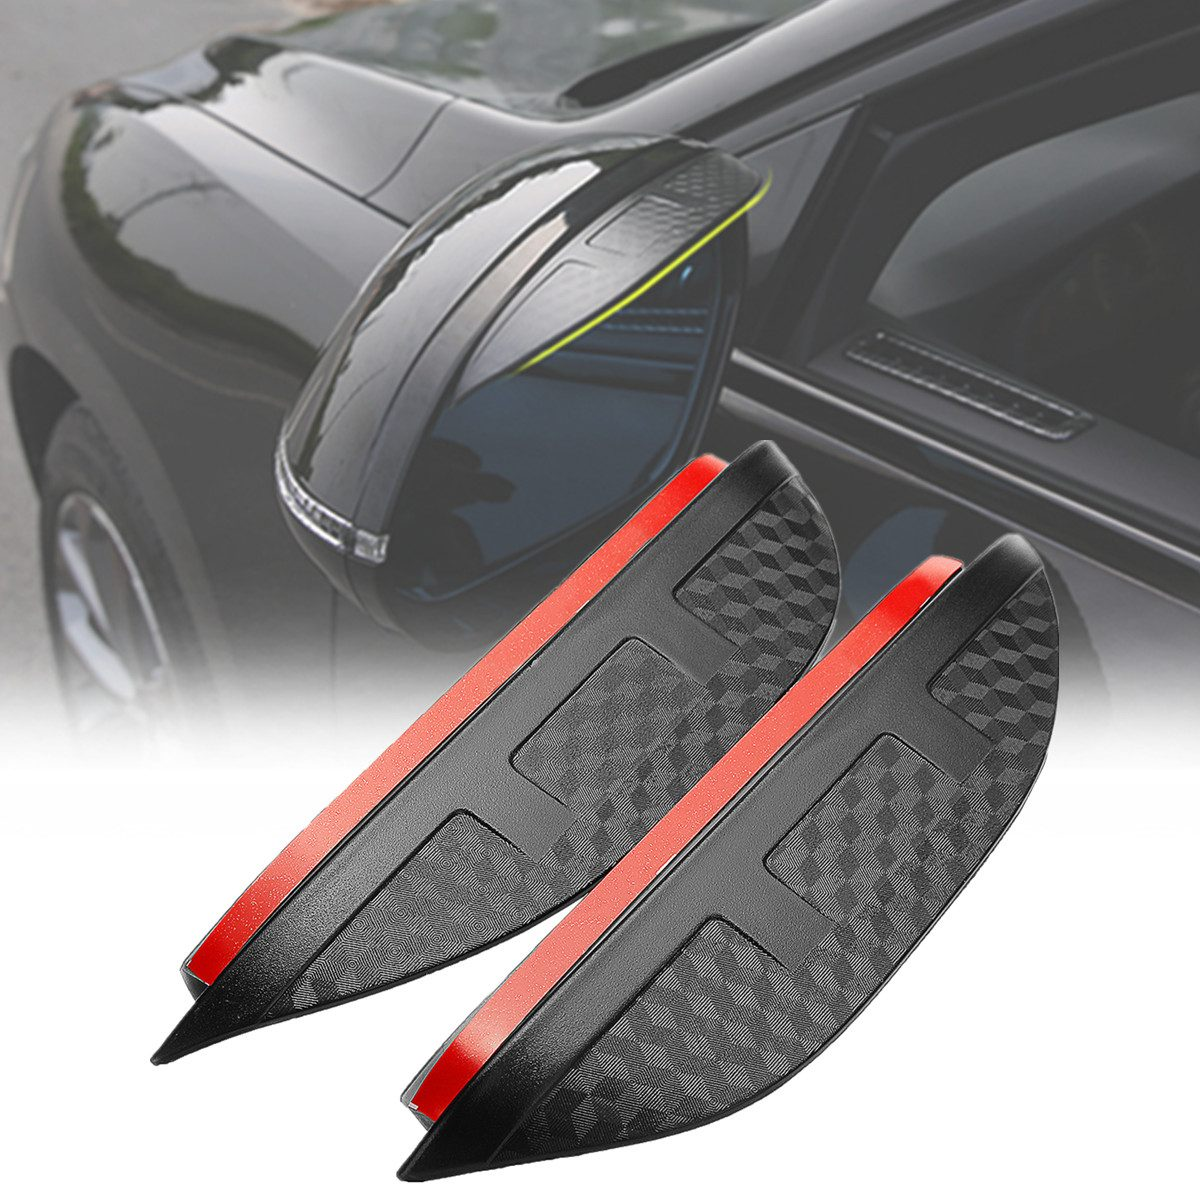 2X Car Rearview Mirror Sun Visor Shade Shield Rain Eyebrow Guard For Toyota-C-HR Carbon Fiber Type Plastic 195x45mm Embossed